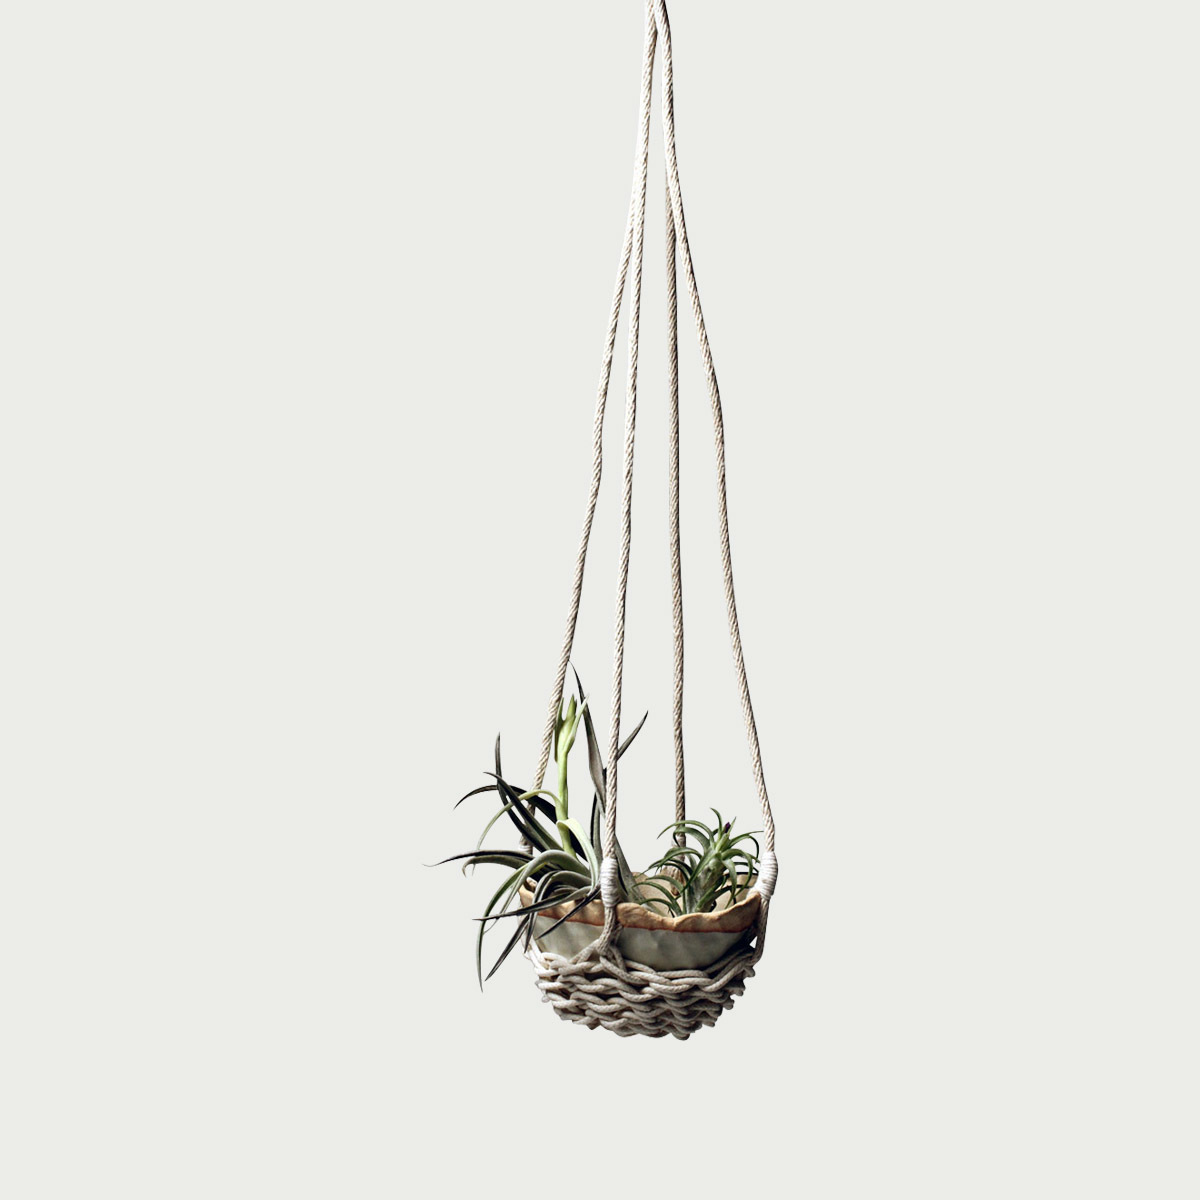 HangingBasket_019.jpg